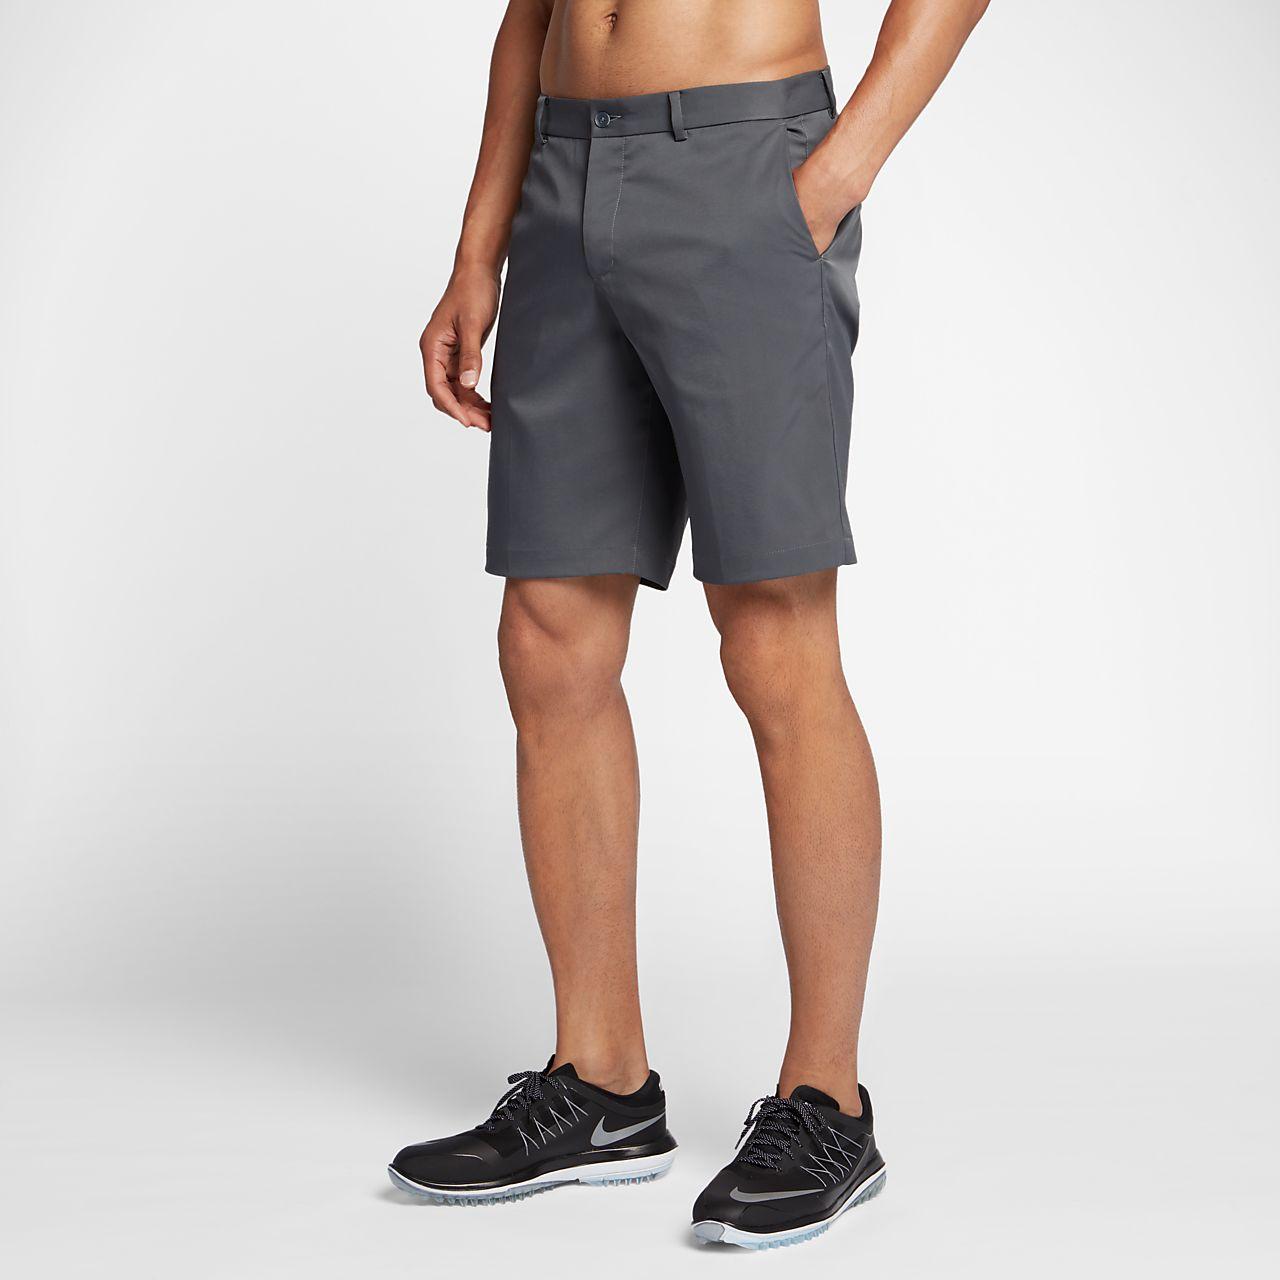 Nike Flat Front Pantalons curts de golf de 26 cm - Home